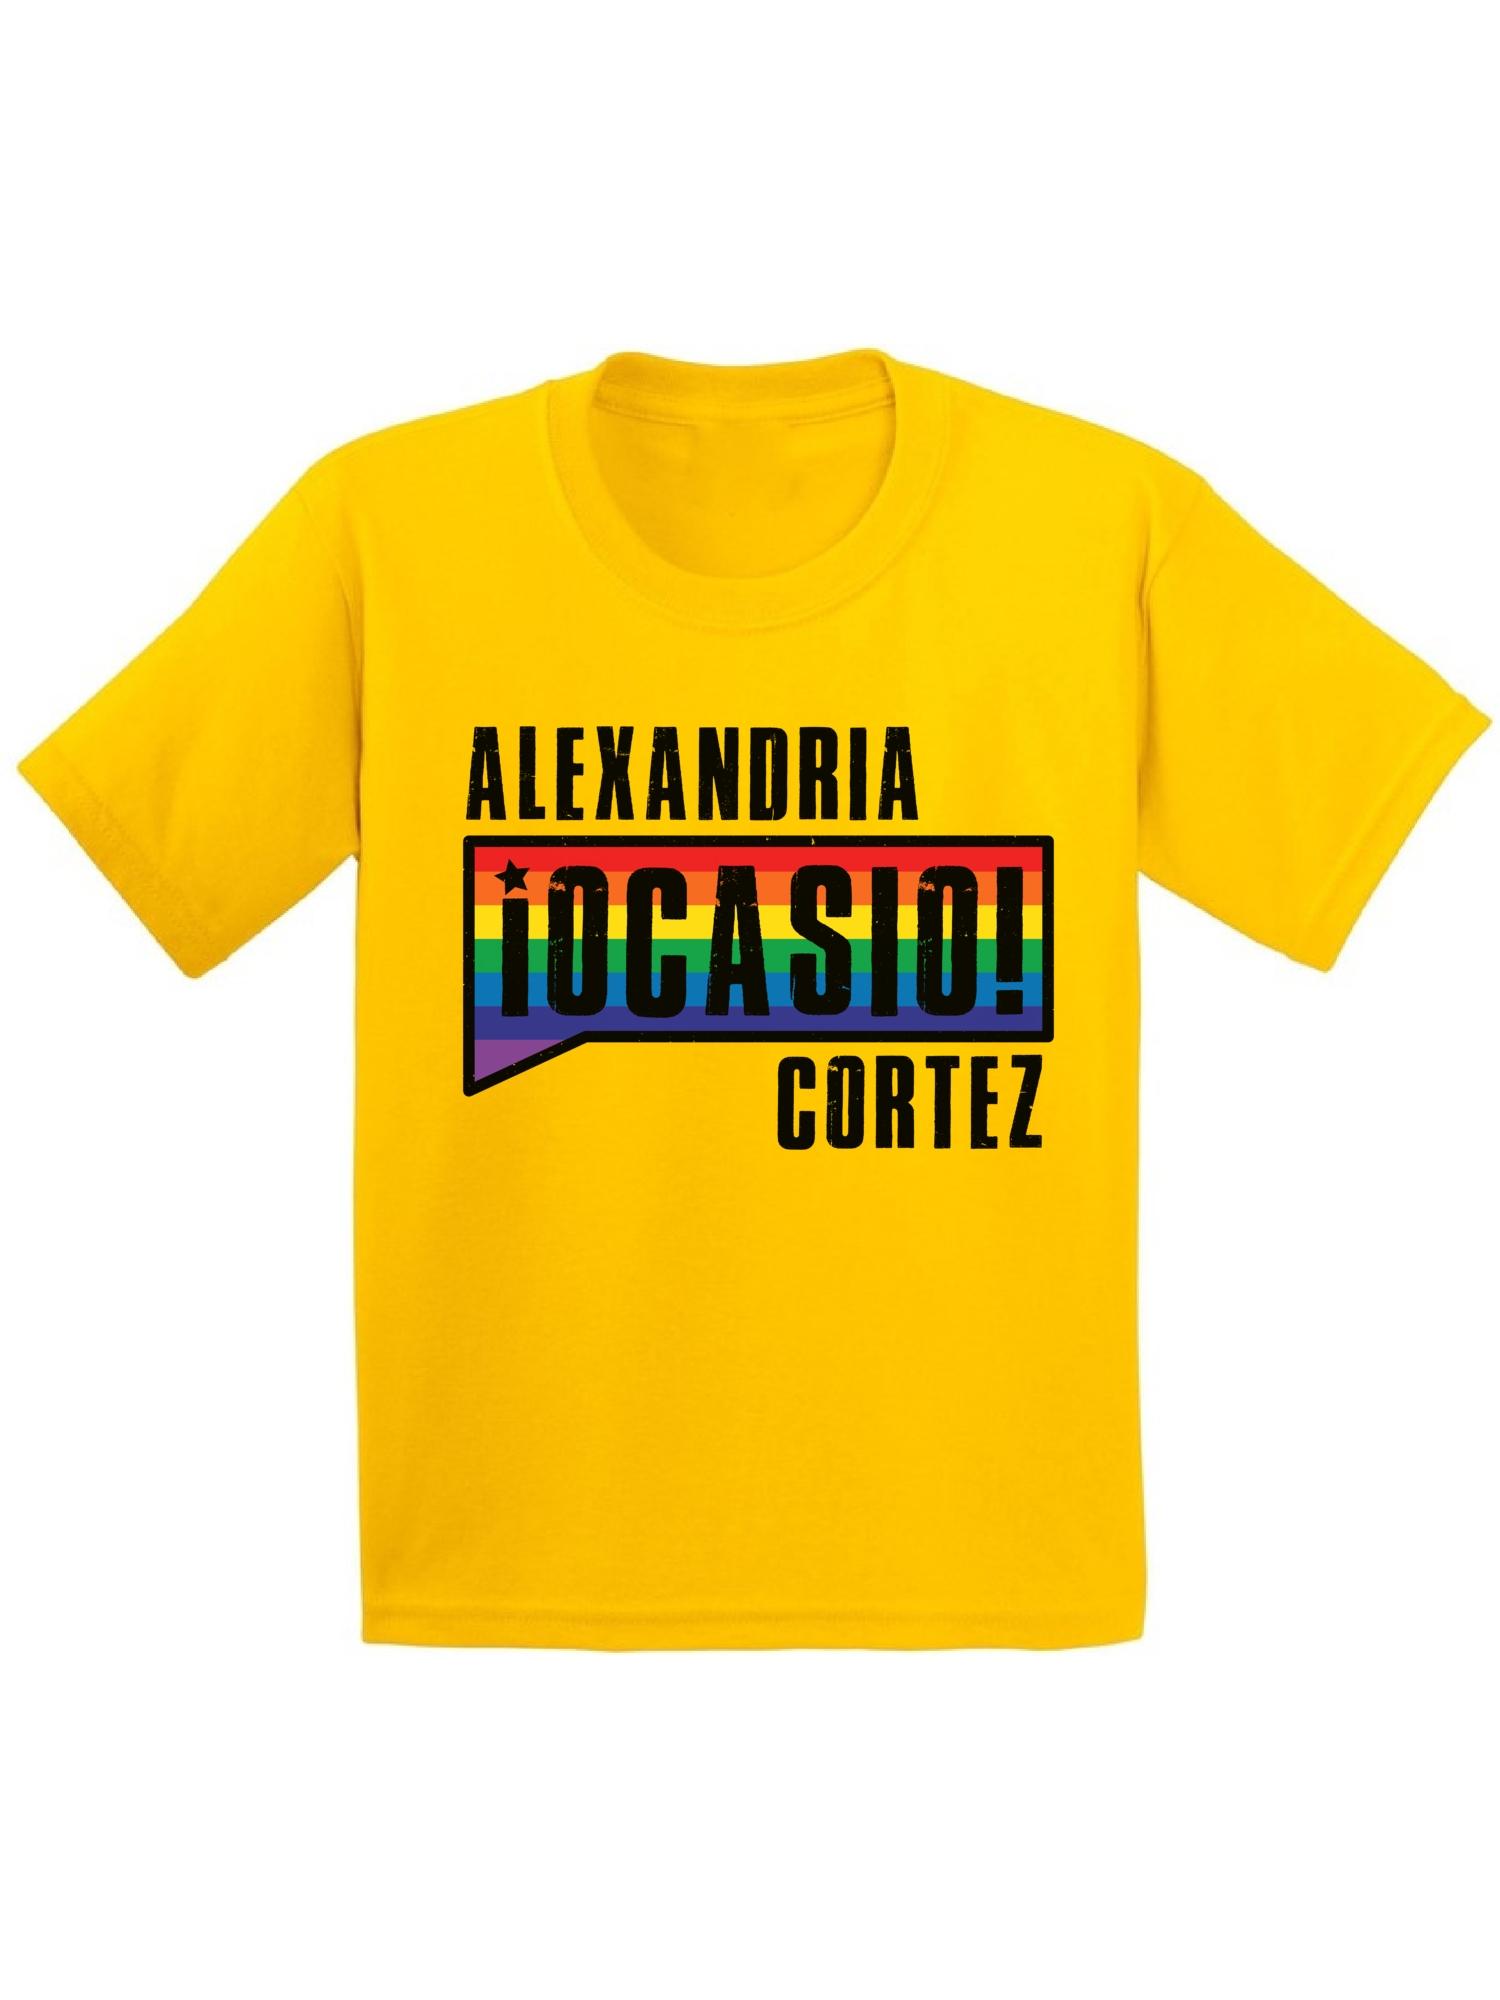 This is my Referee Logo shirt Kids Tee Shirt Boys Girls Unisex 2T-XL